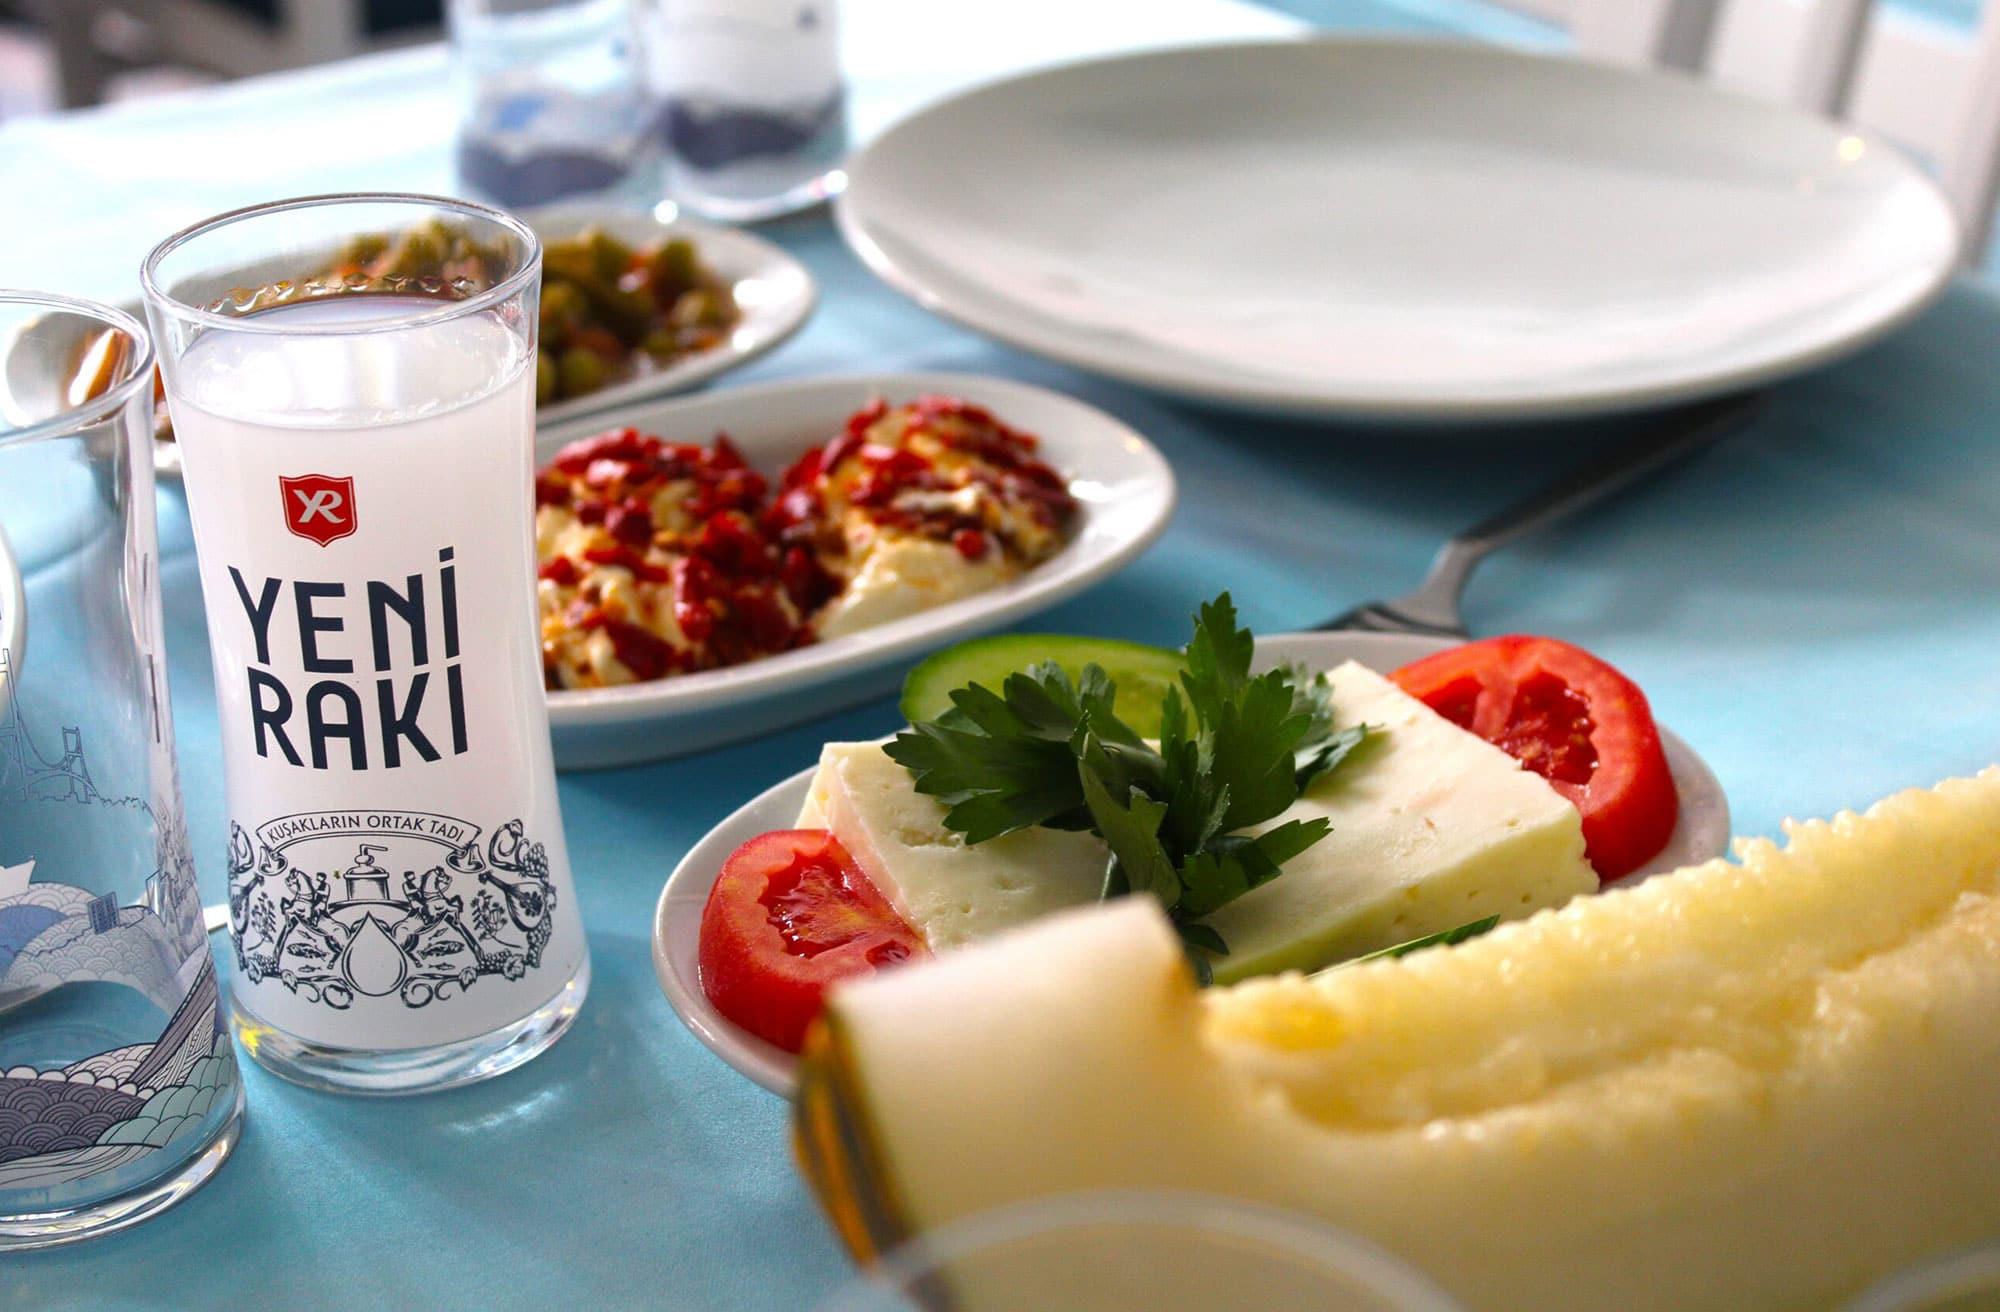 Turkish Raki: National Drink of Turkey